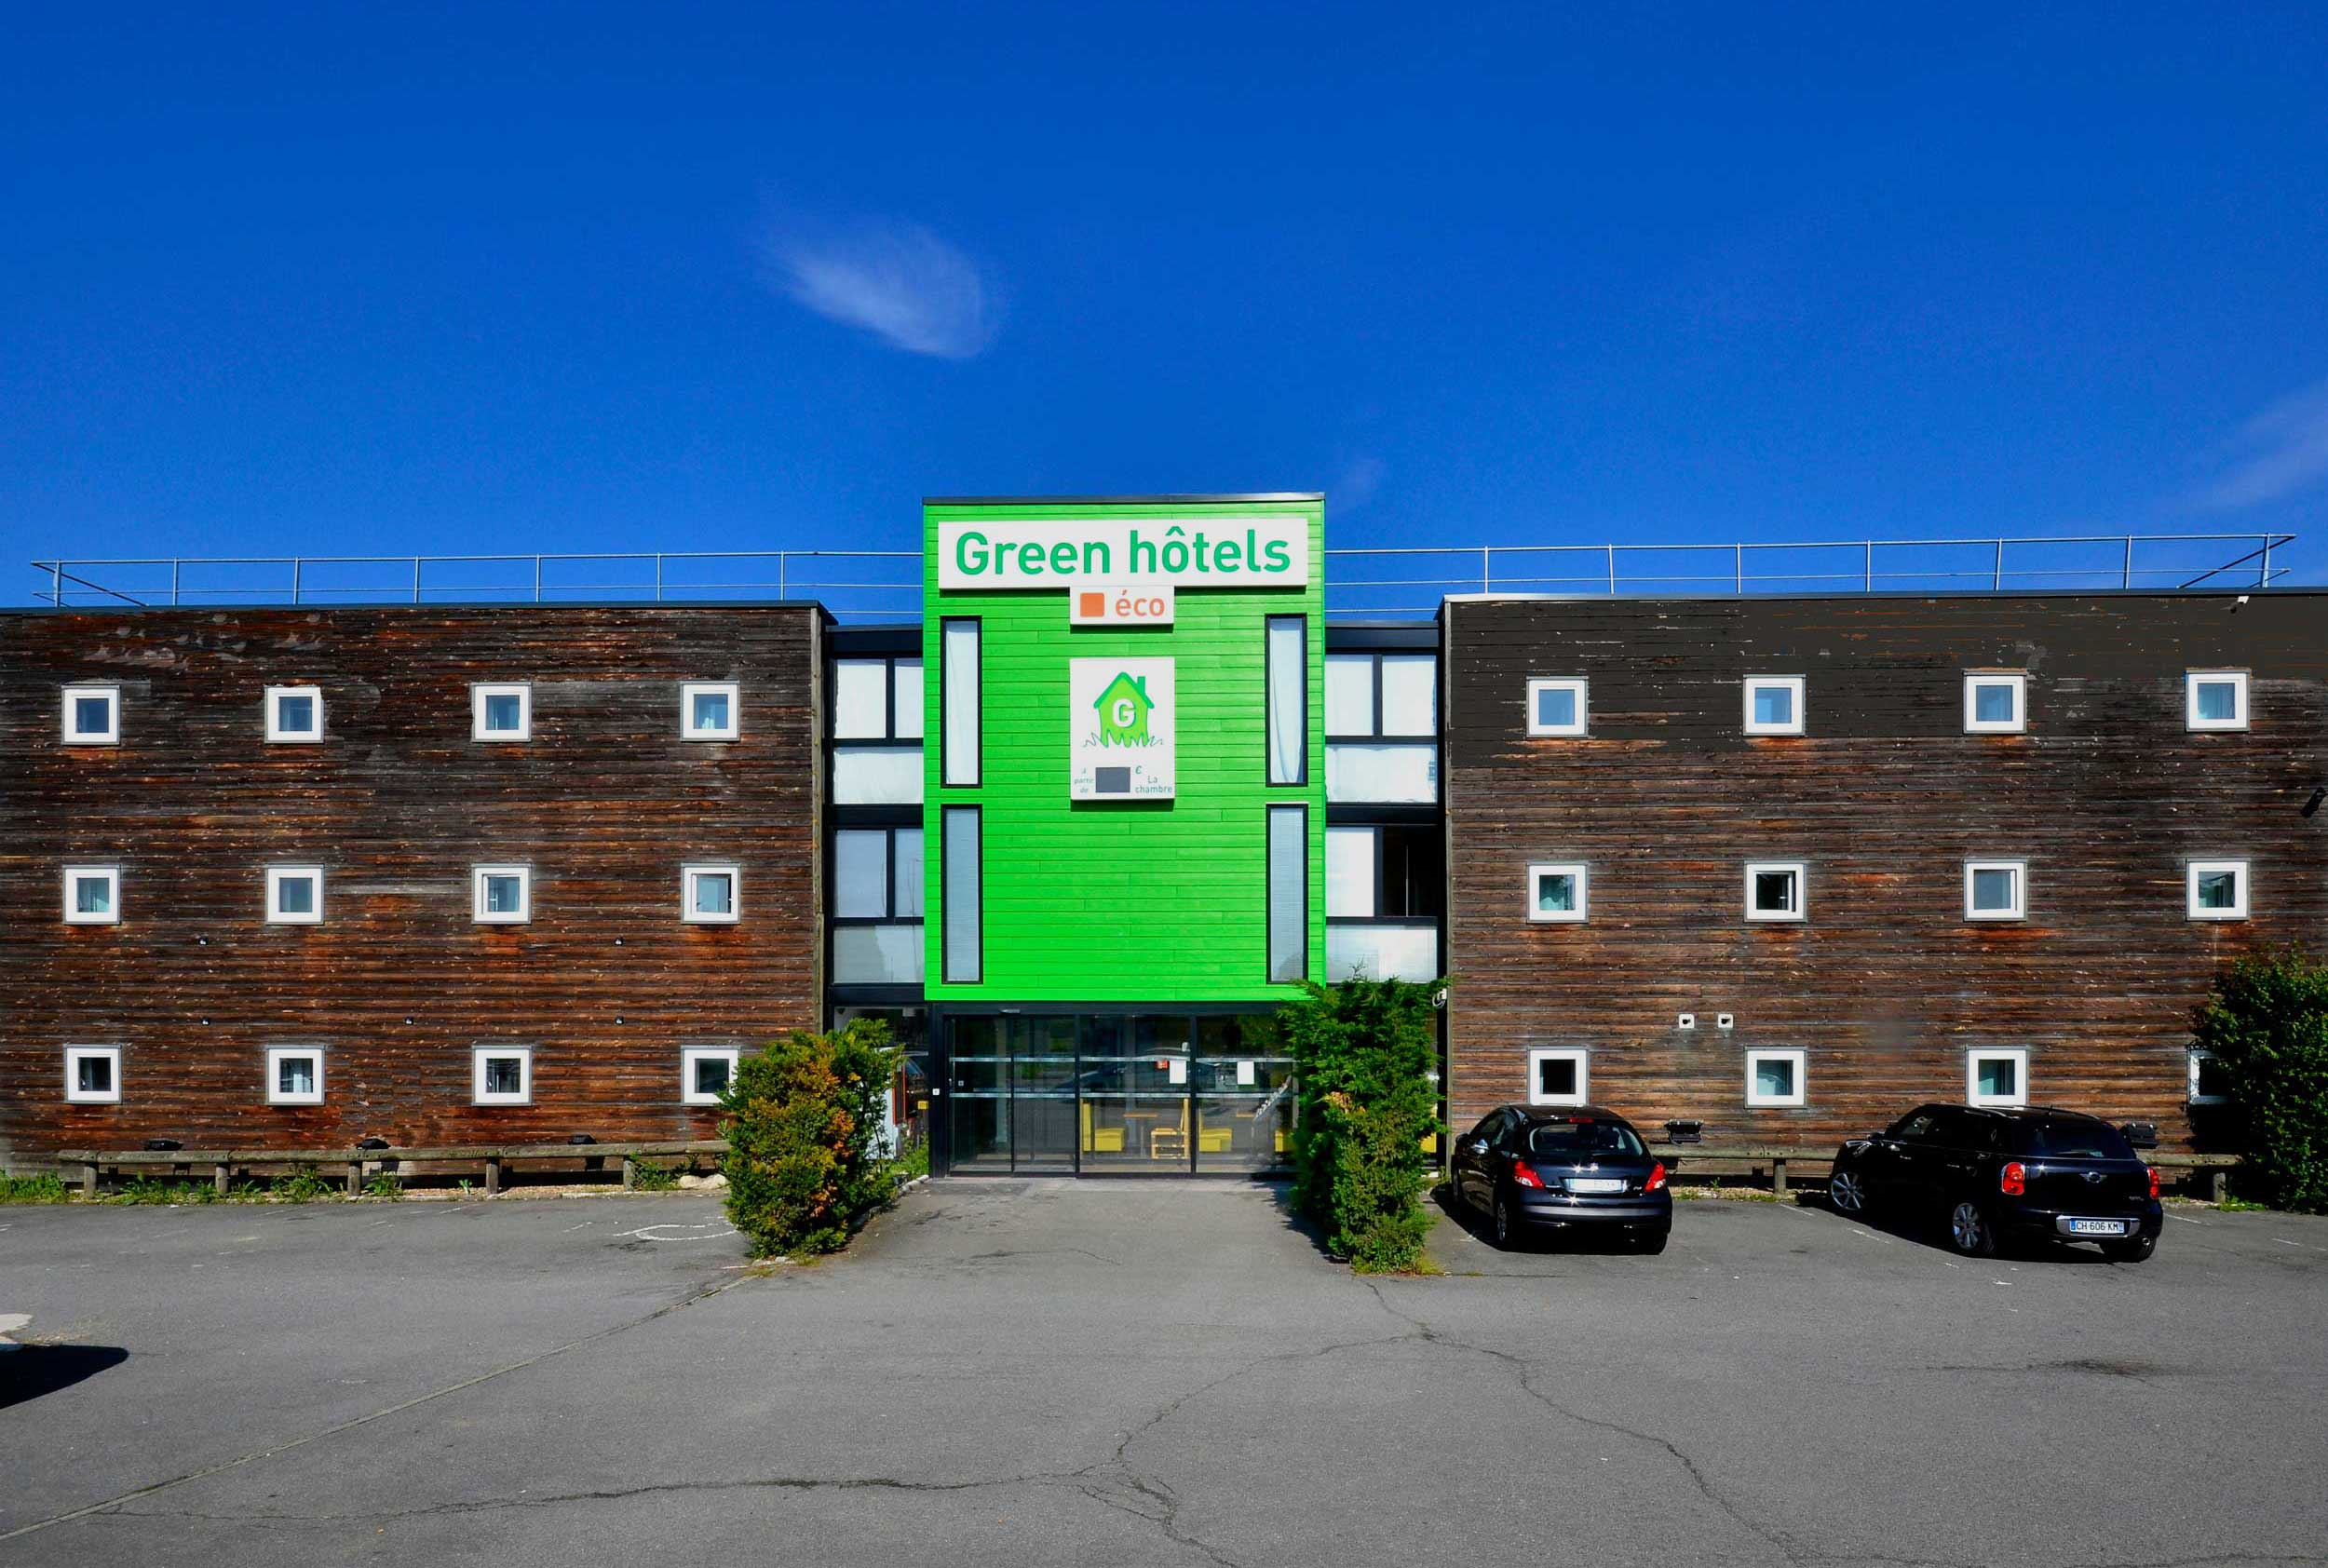 Green Hotel Sainte Genevieve Des Bois u2013 Myqto com # Green Hotel Sainte Genevieve Des Bois